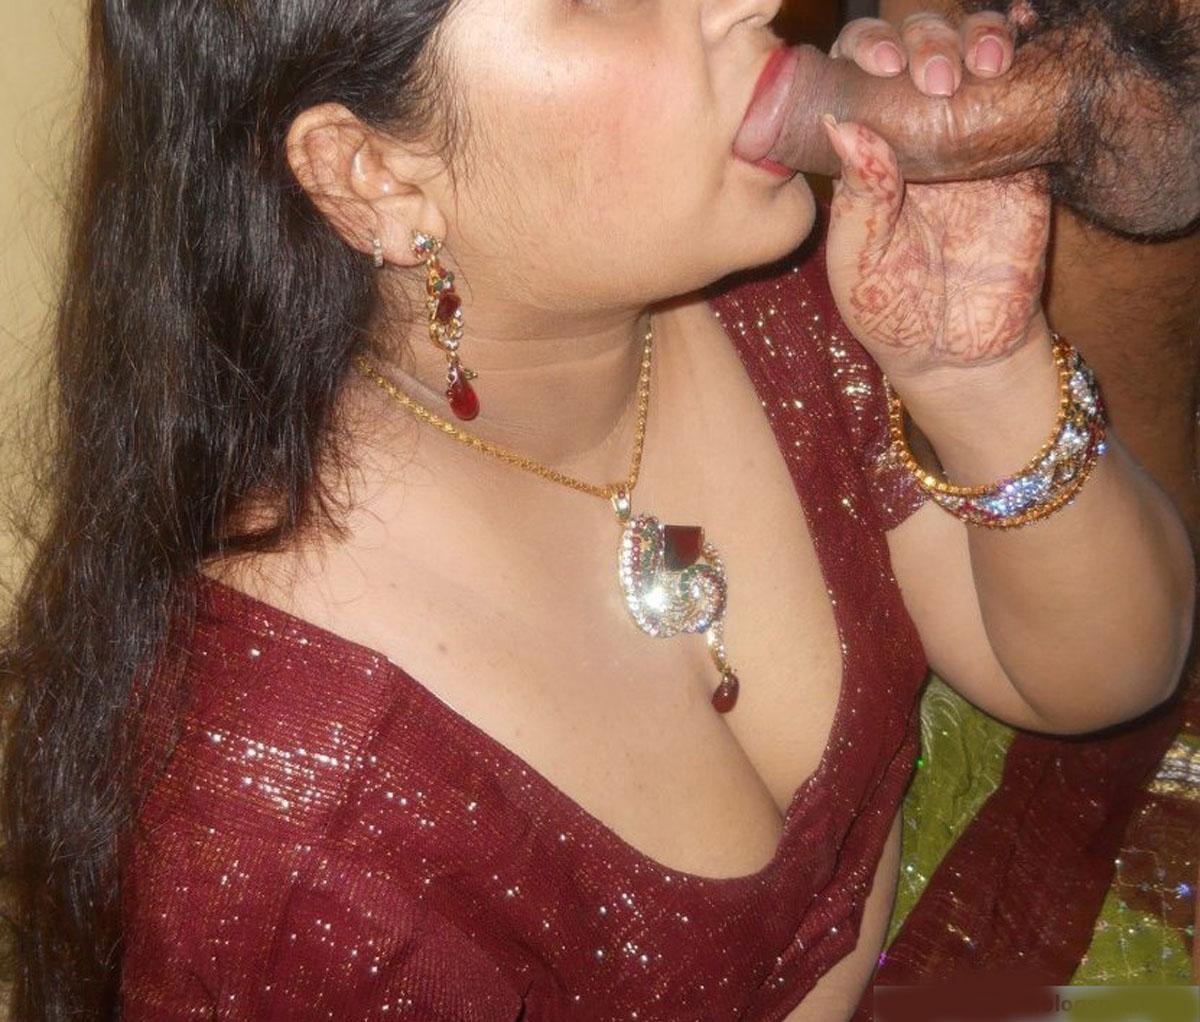 Free Indian Mature Aunty Porn Pics